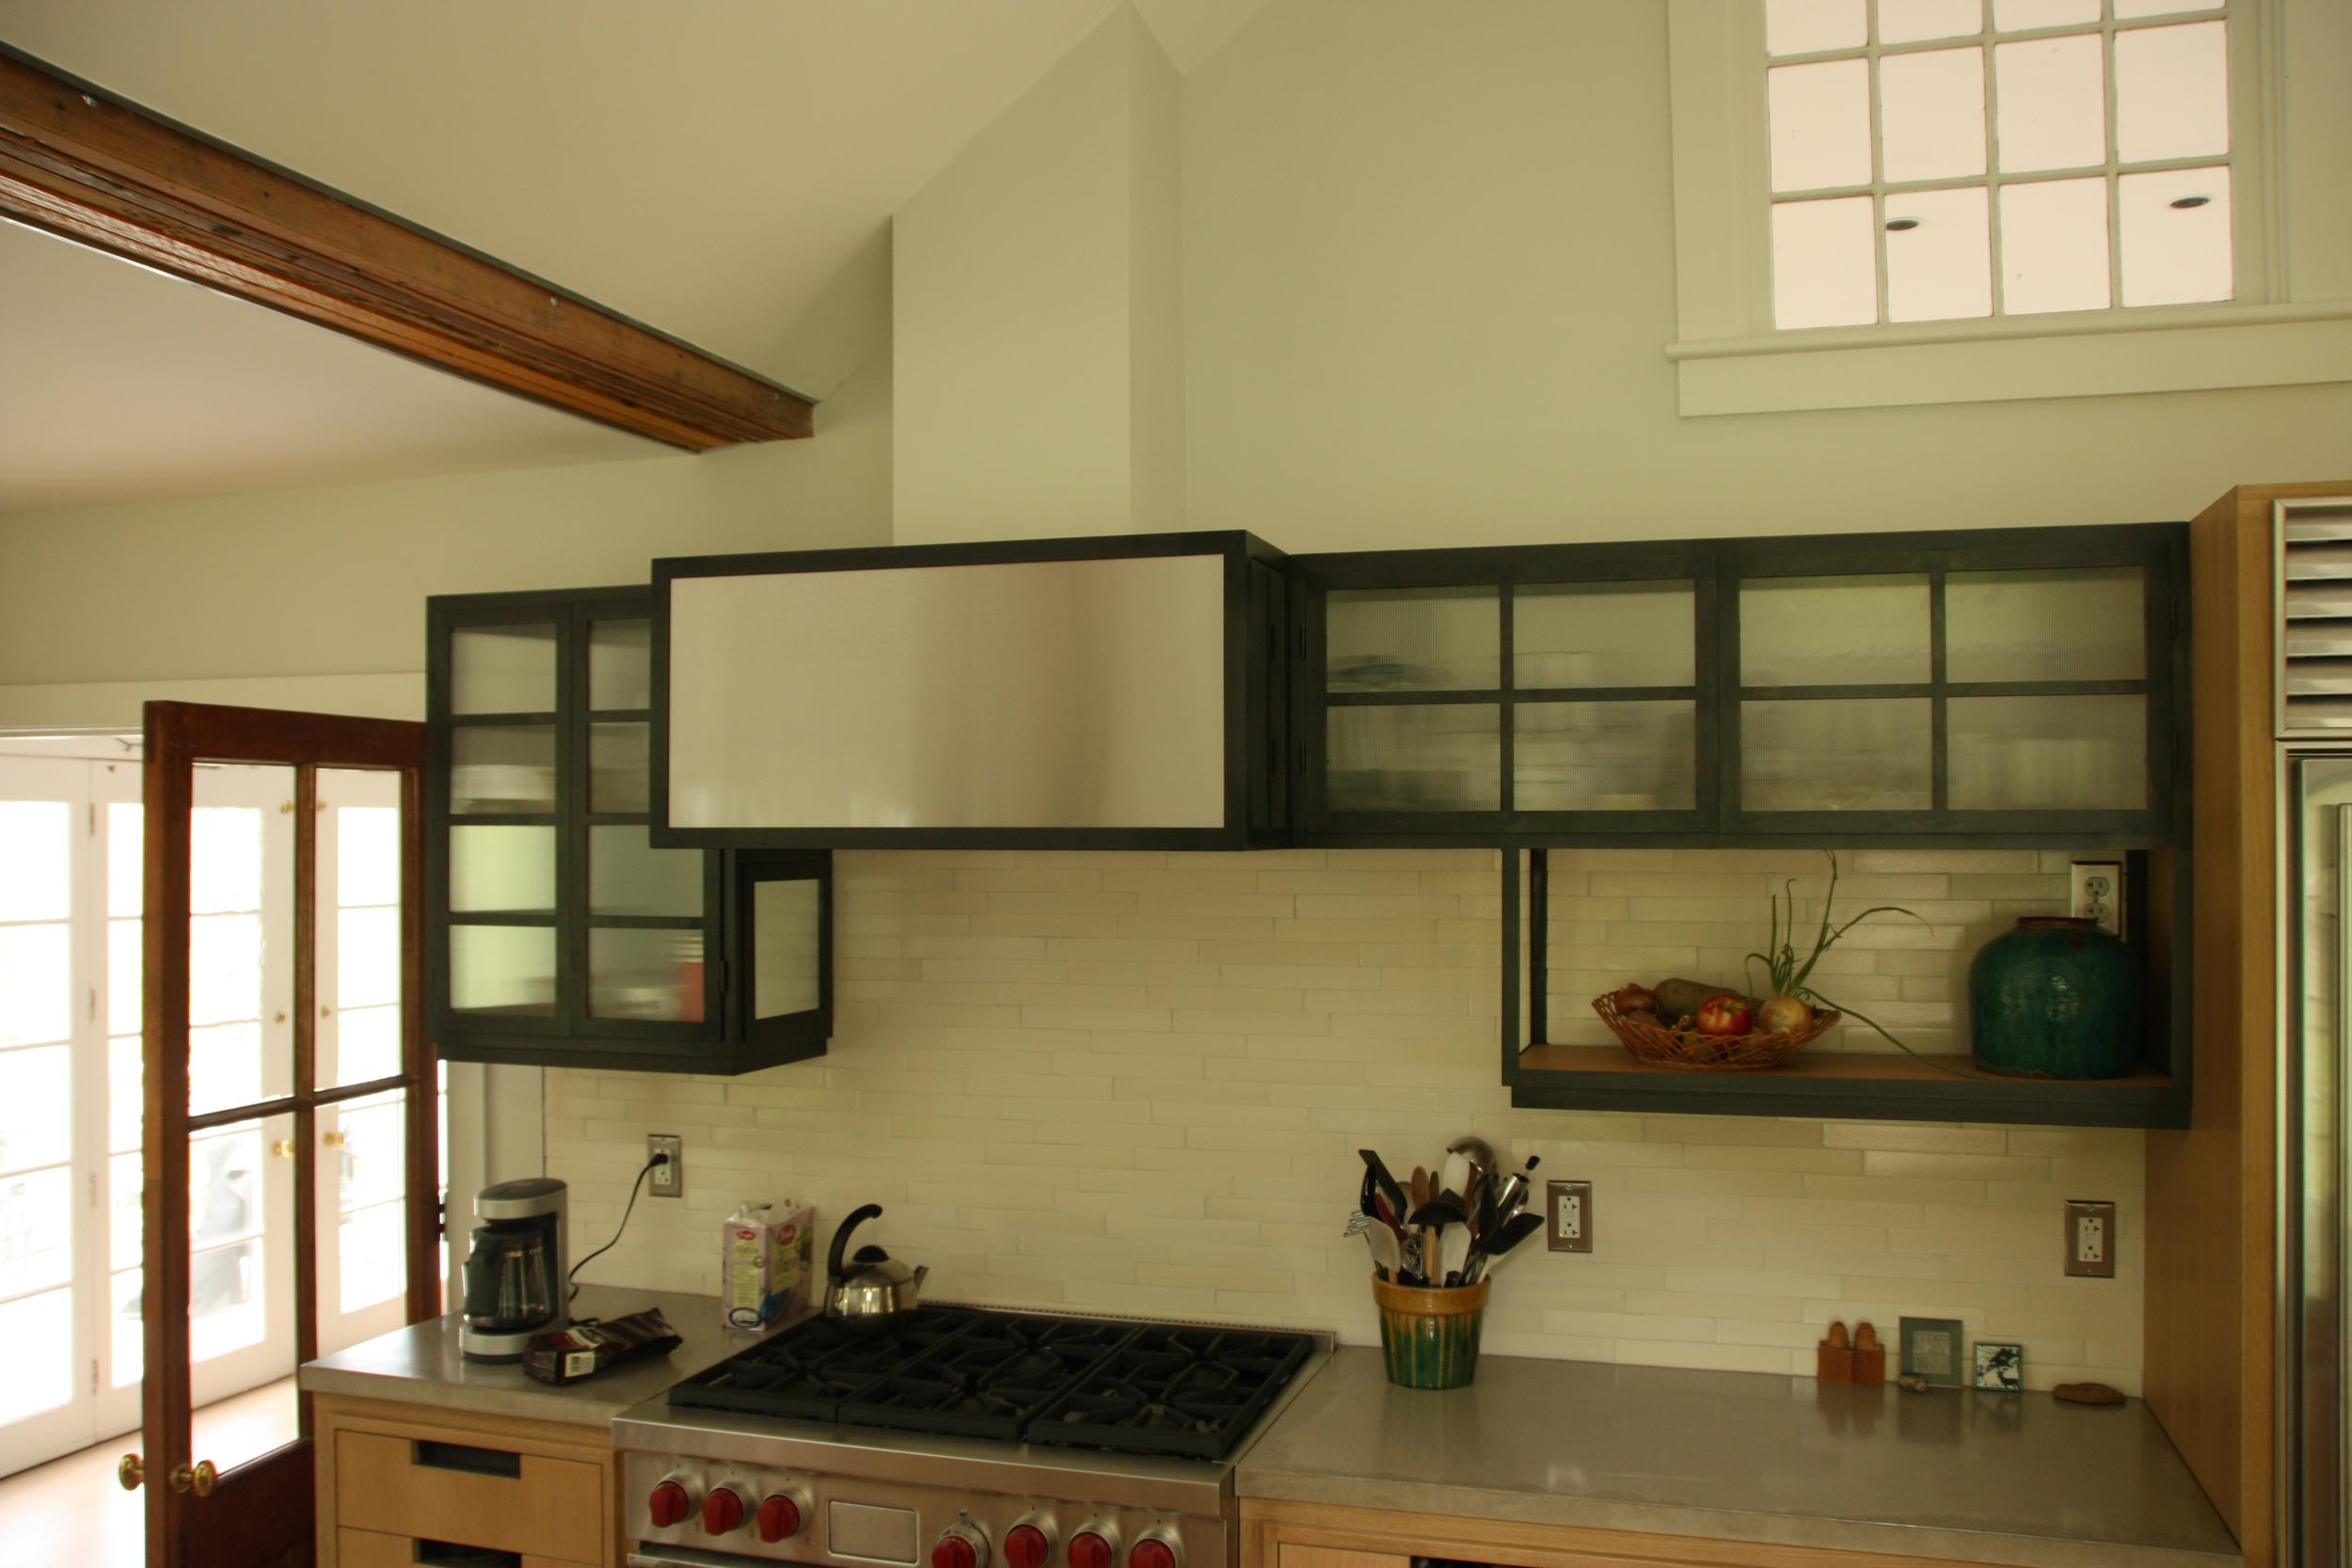 Custom Metal Kitchen Cabinets Work And Welding Classes In New York City Michael Daniel Design